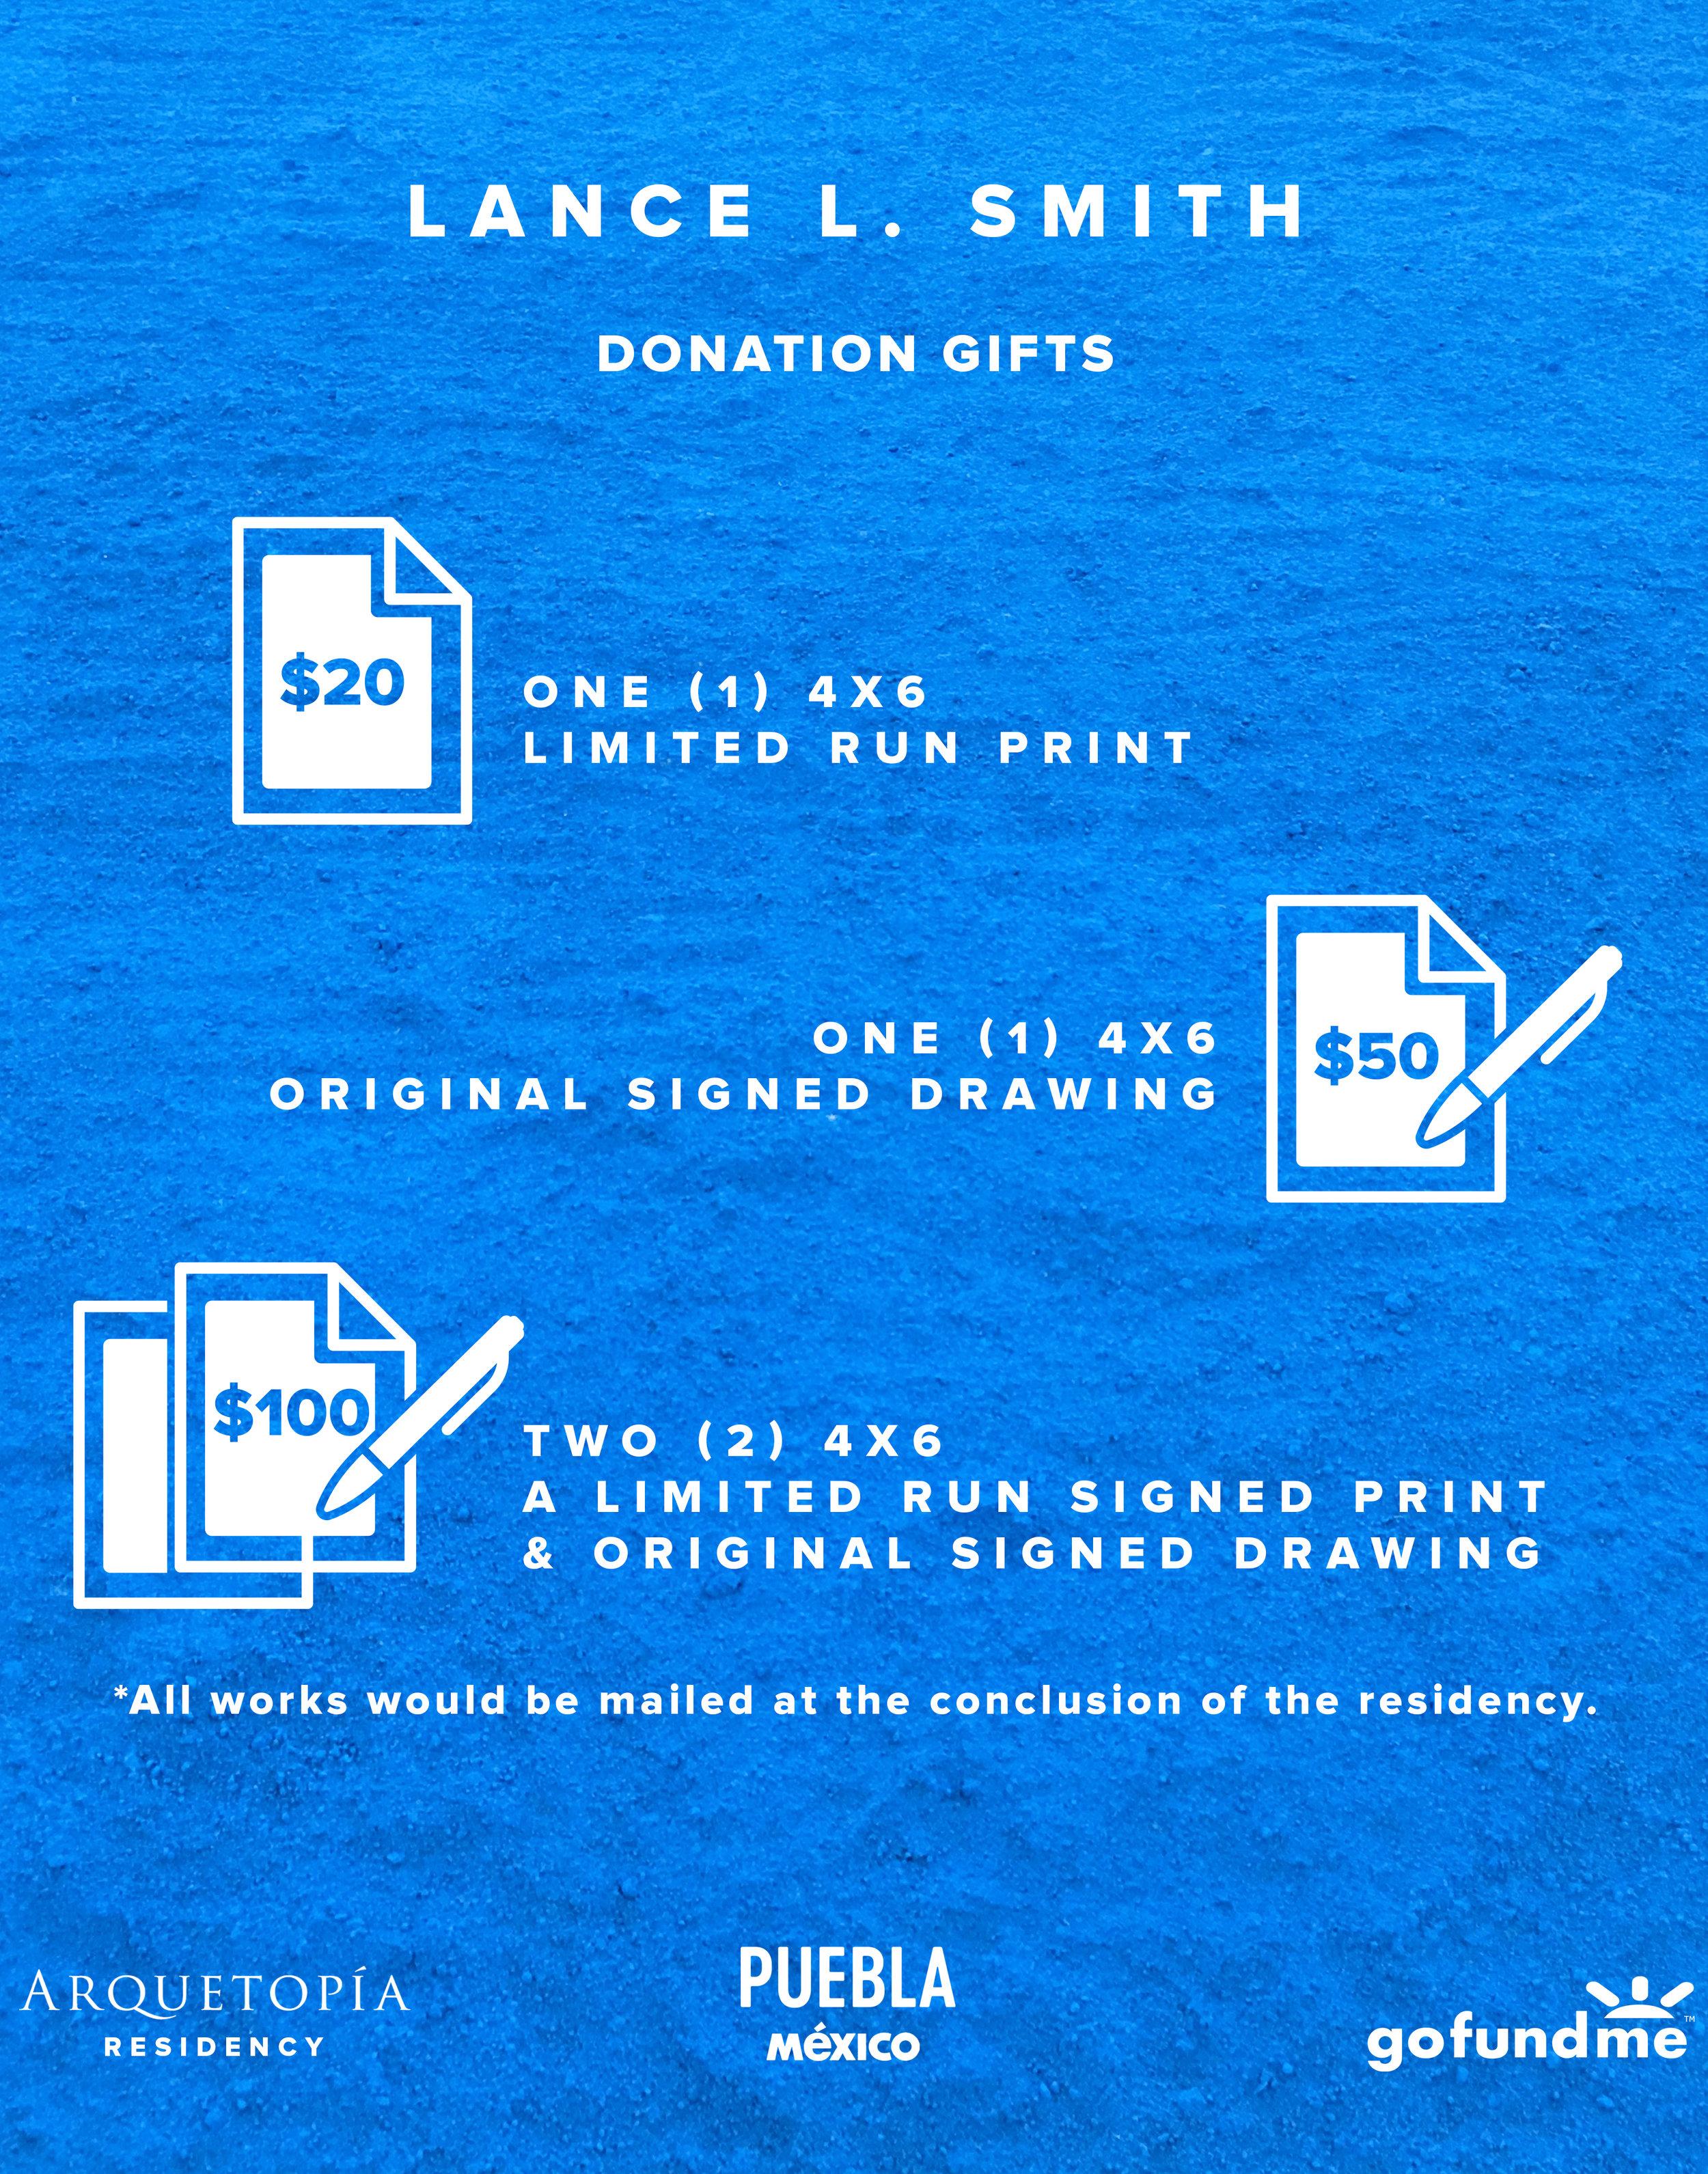 DonationList.jpg